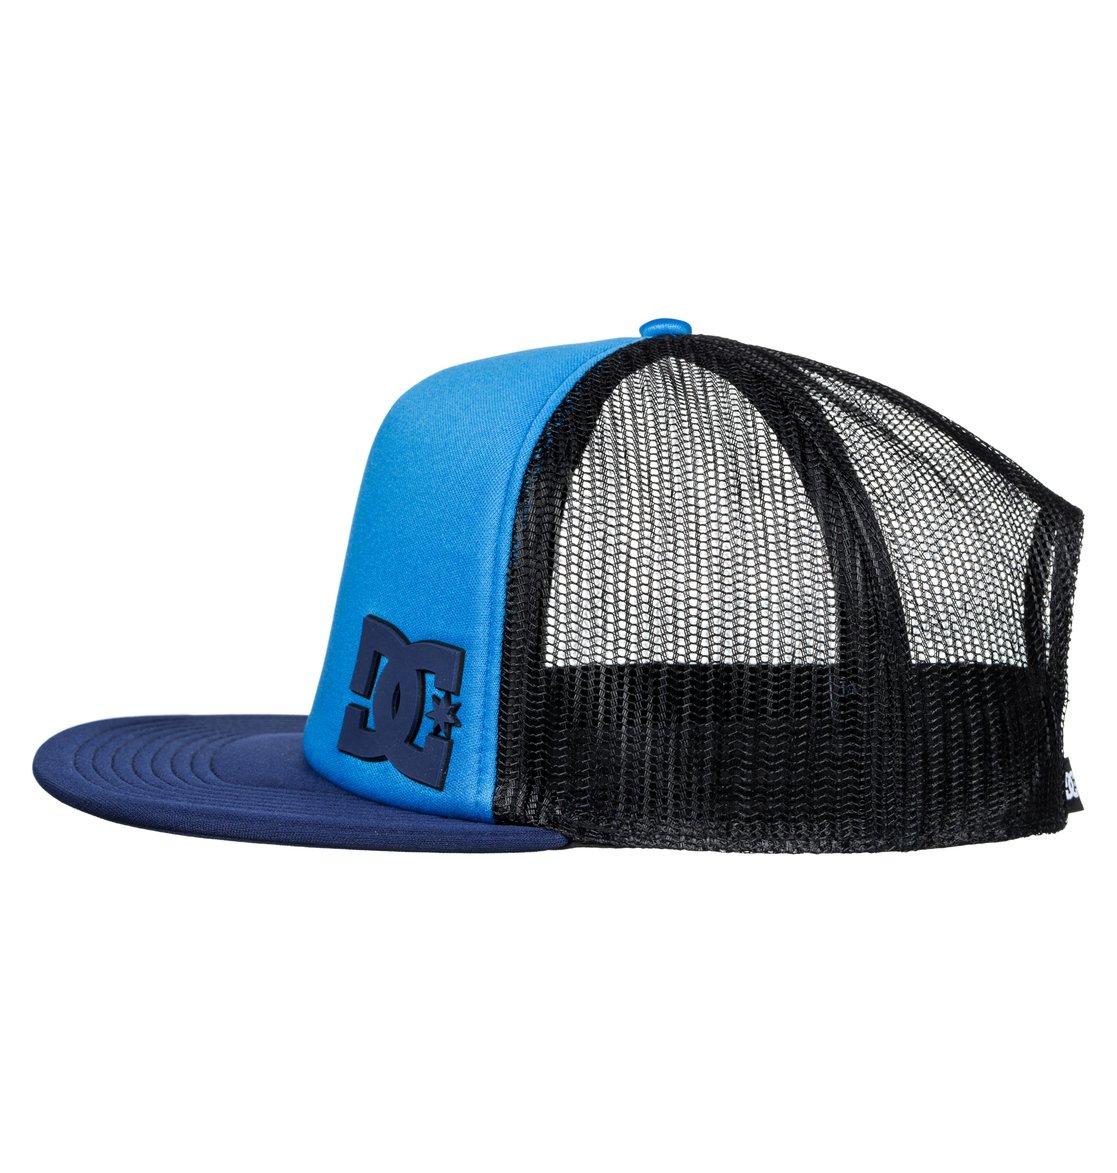 2ff7da82d2461 1 Madglads - Gorra Trucker Azul ADBHA03048 DC Shoes